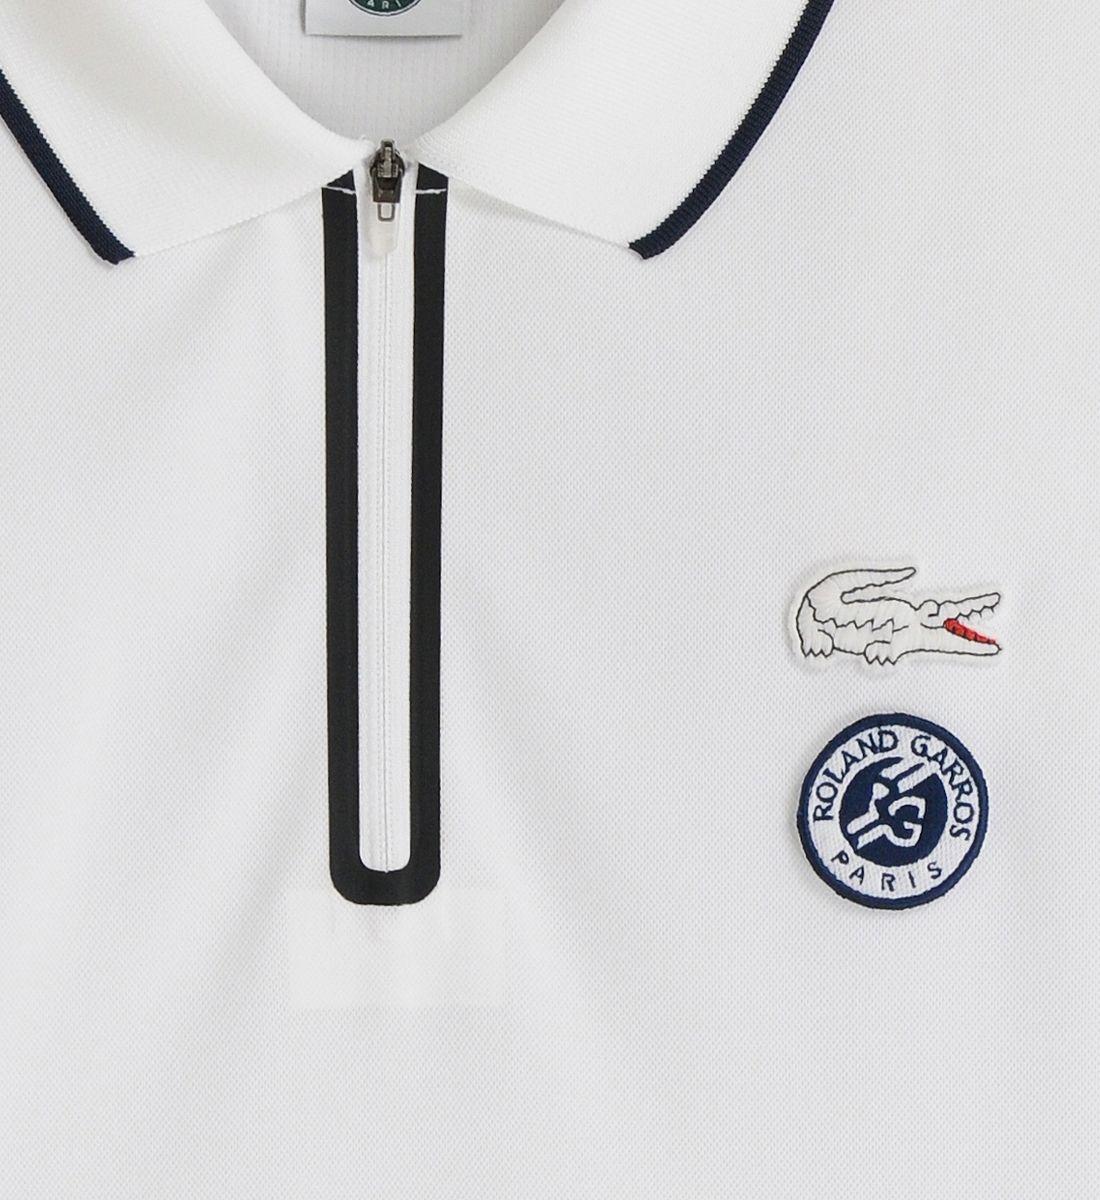 GraphiquesPoloShirt Détails Garros Garros Polo GraphiquesPoloShirt Polo Détails Roland Roland uKJ5lF1c3T